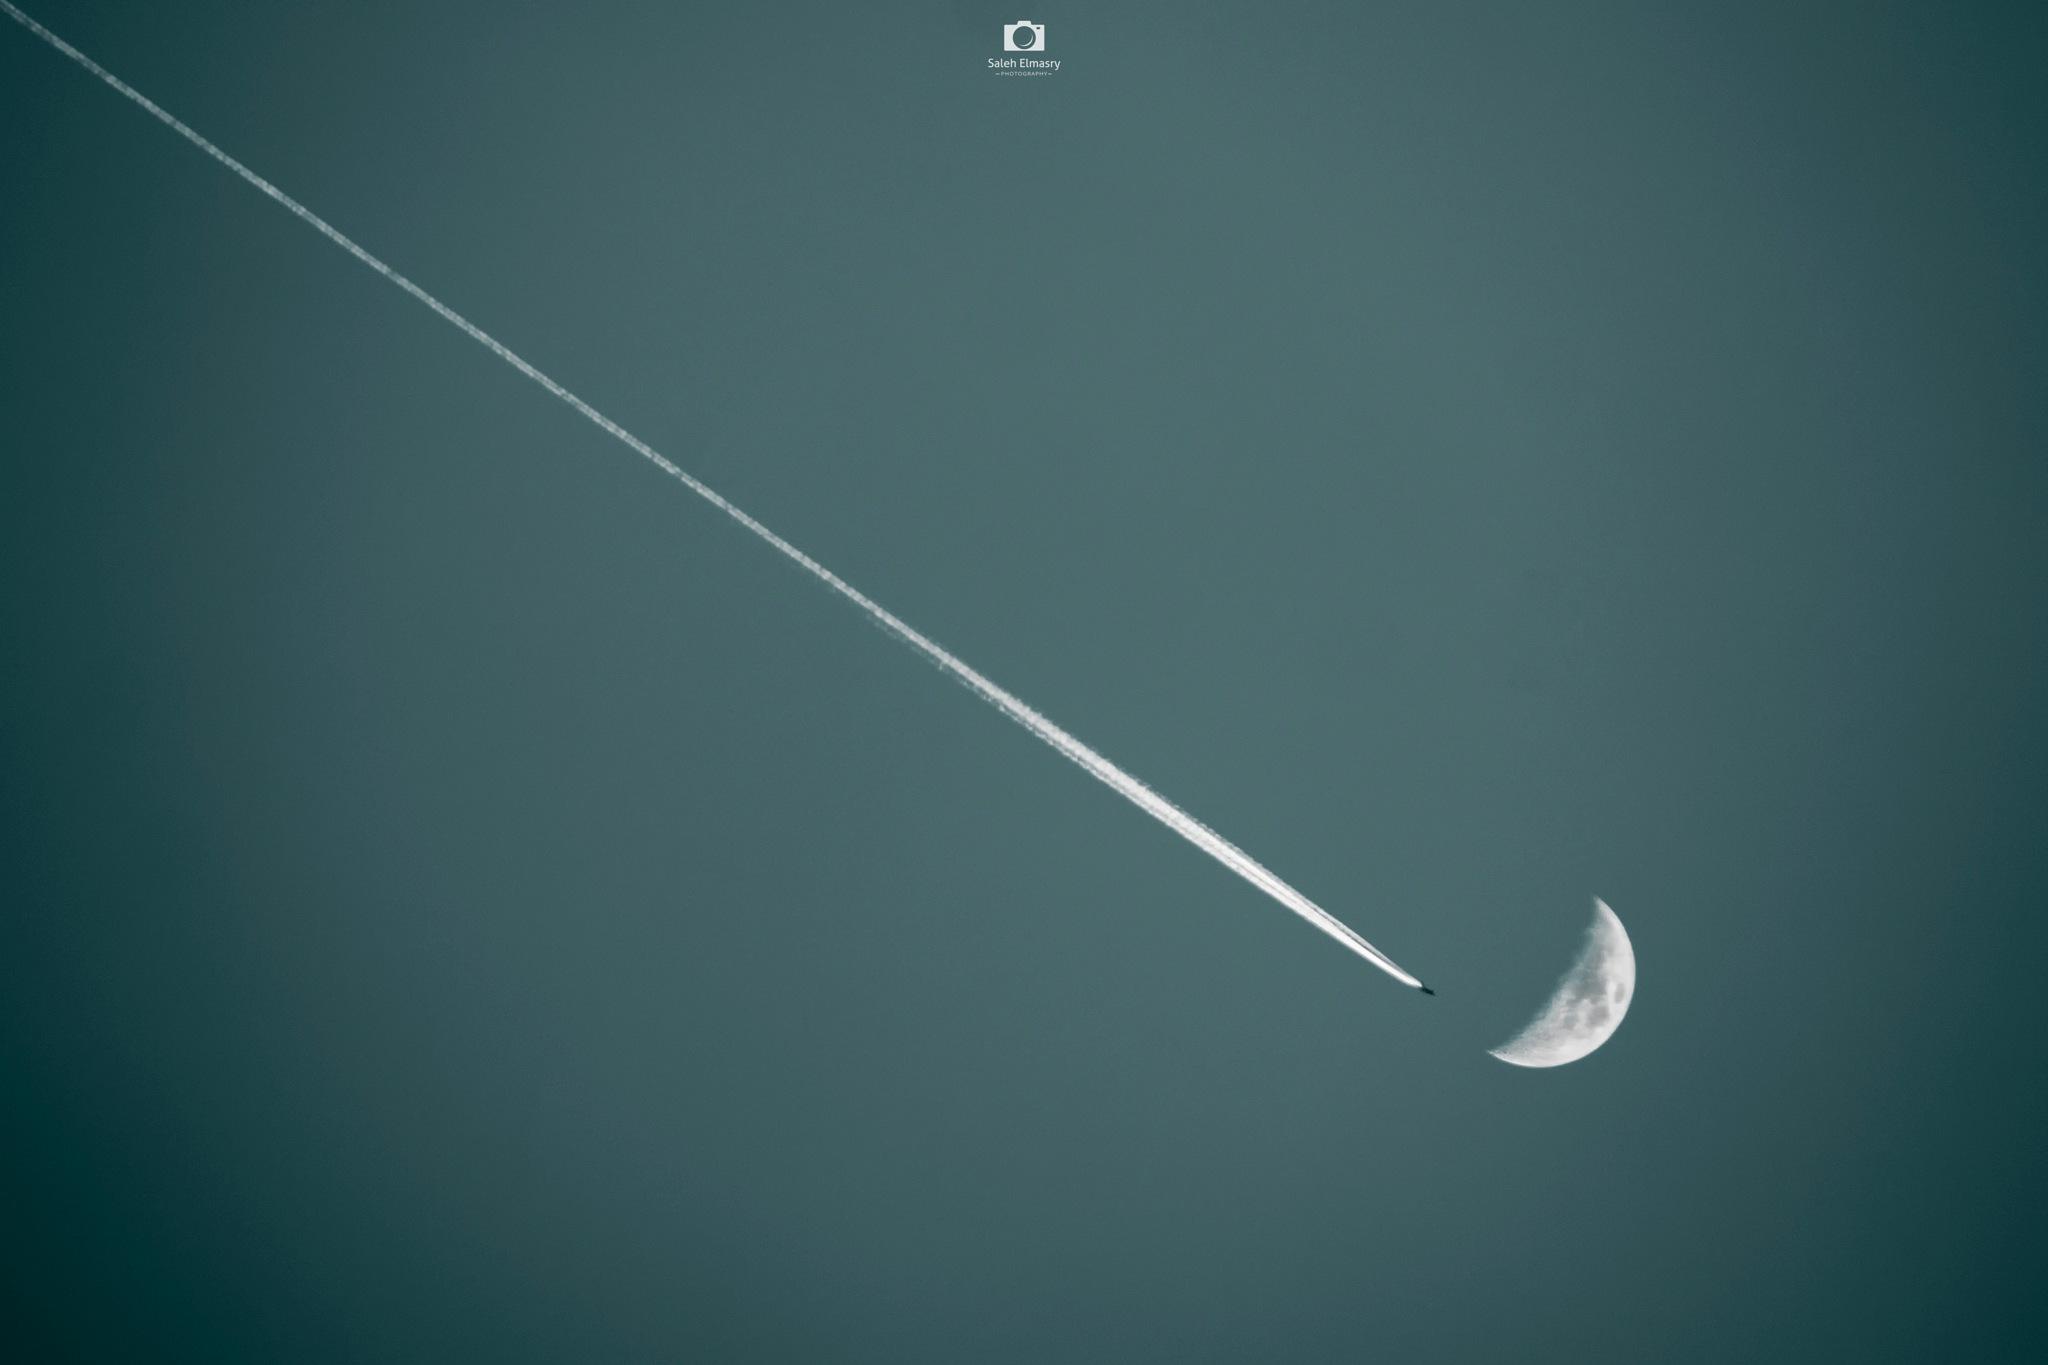 Towards the moon by Saleh Almasry